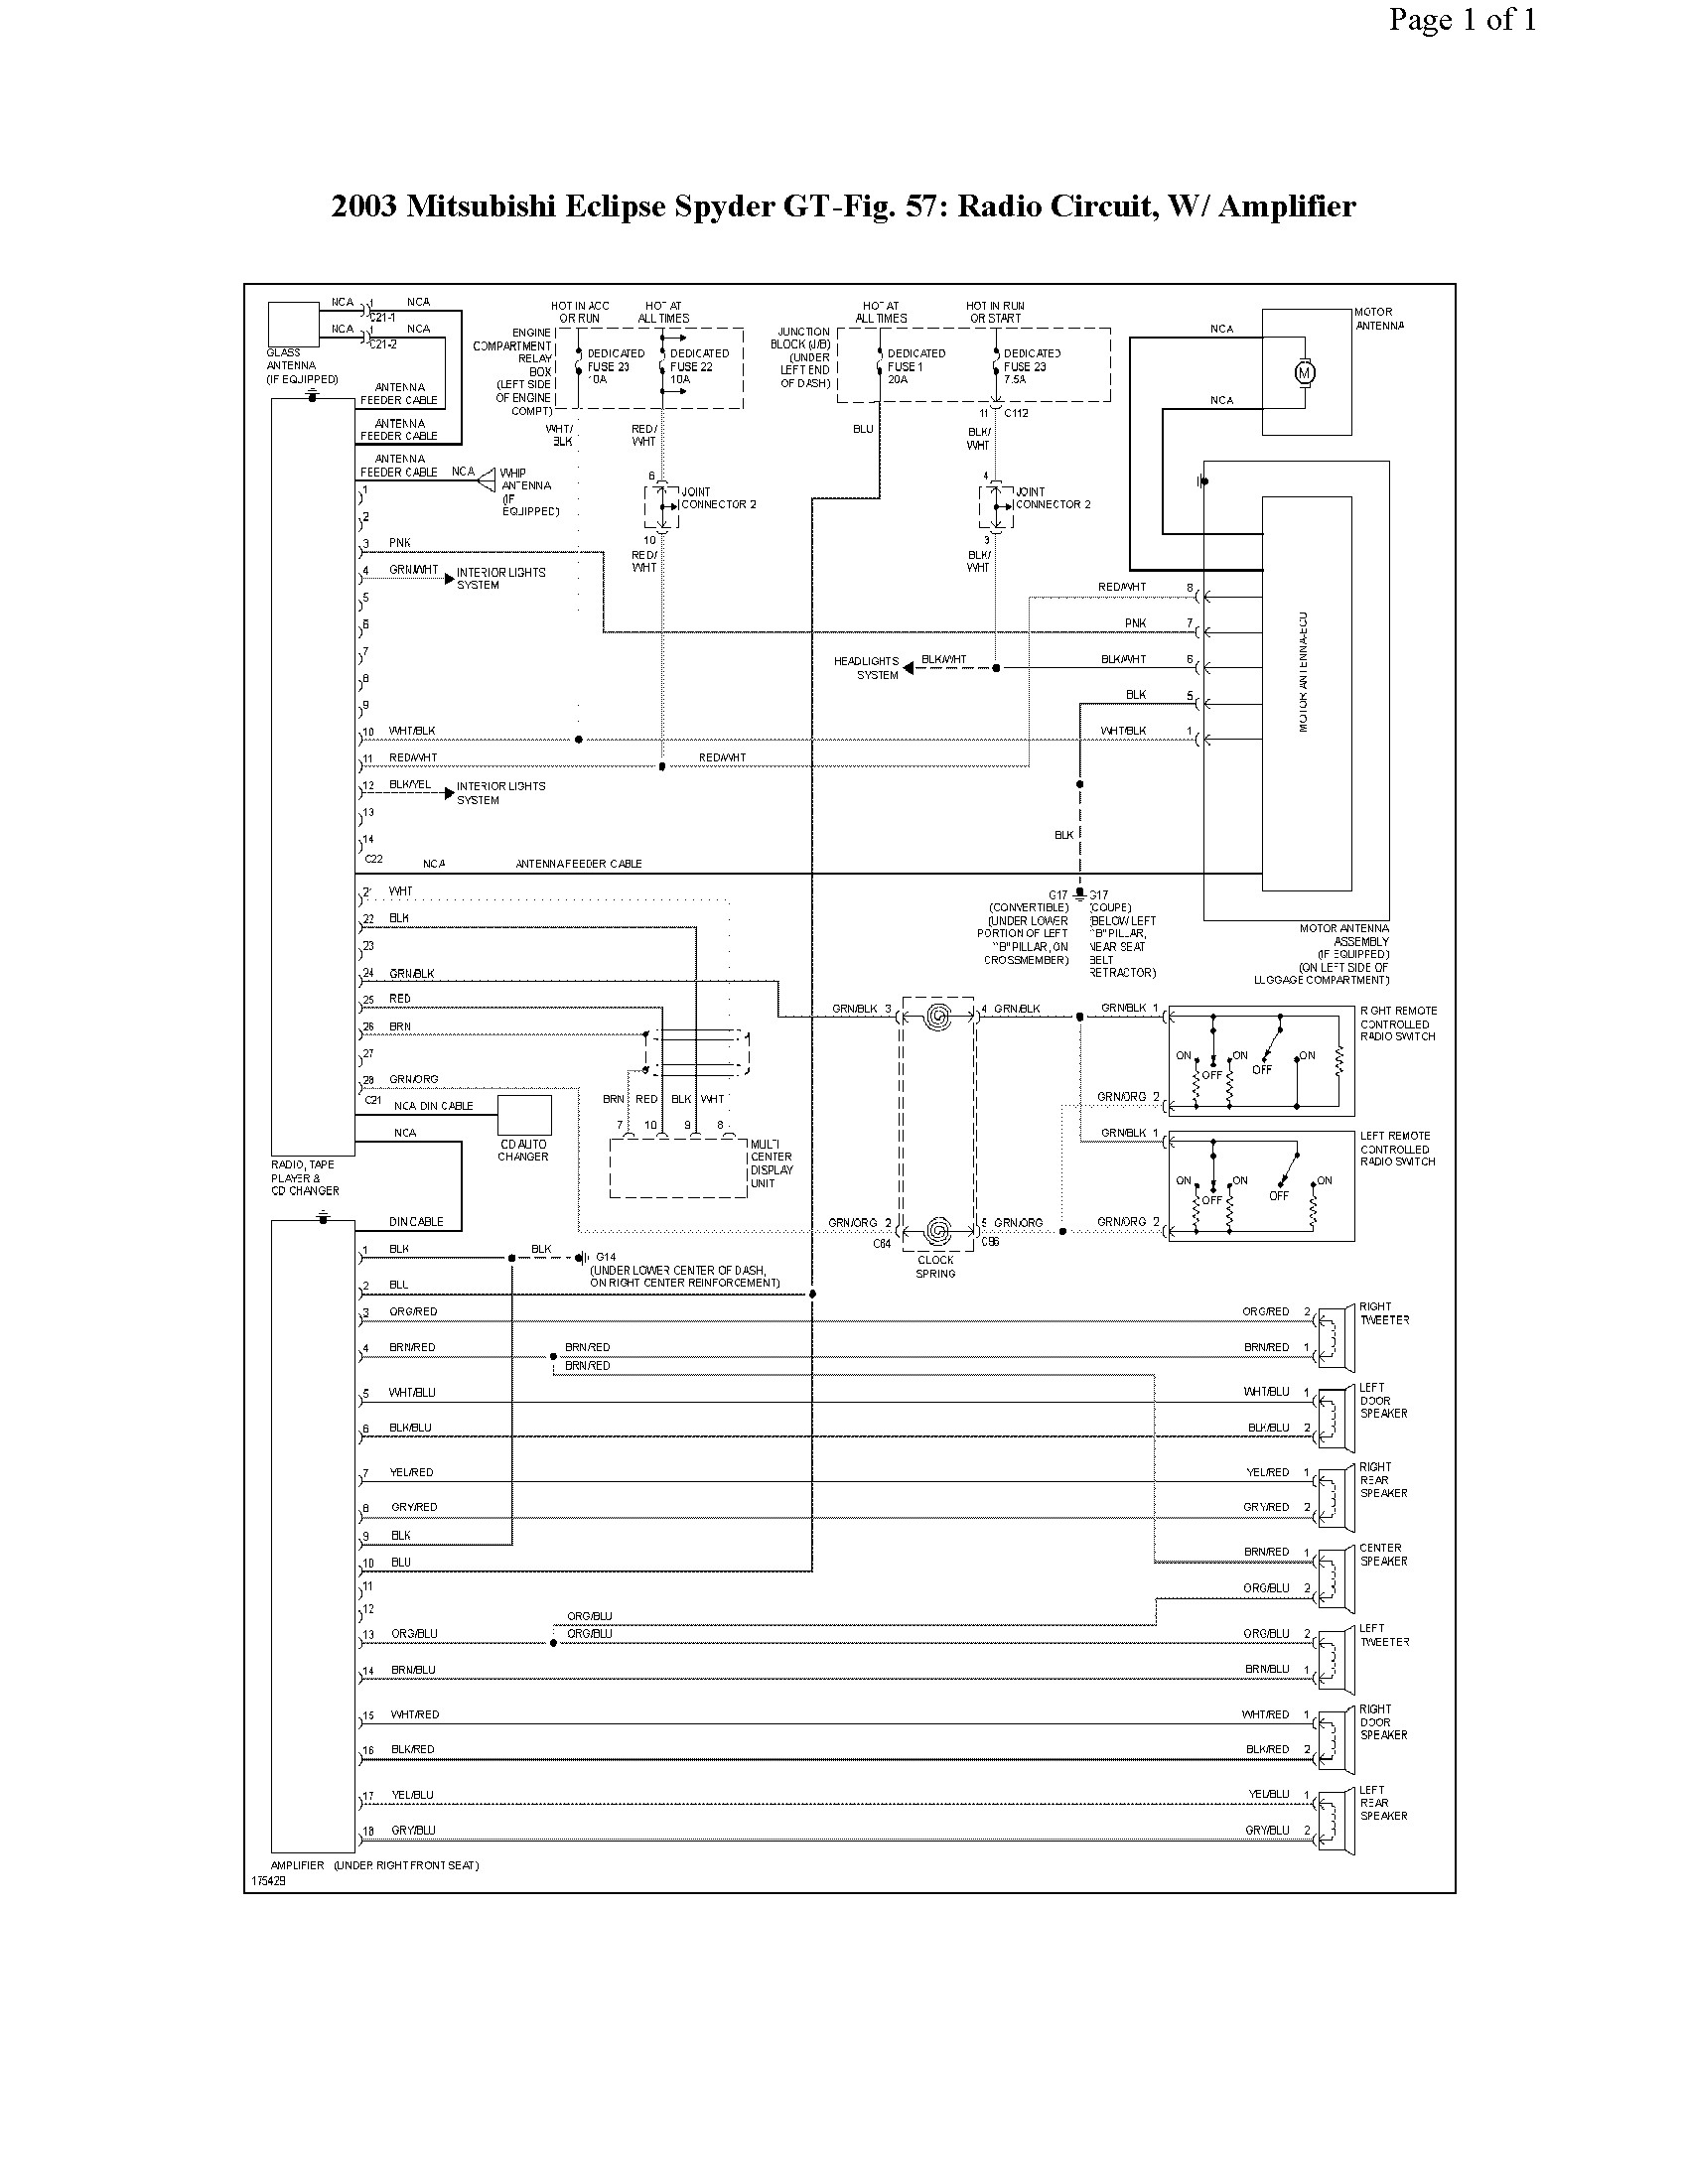 hight resolution of 2003 eclipse wiring diagram electrical schematic wiring diagram 2003 mitsubishi eclipse wire tuck 2003 eclipse engine